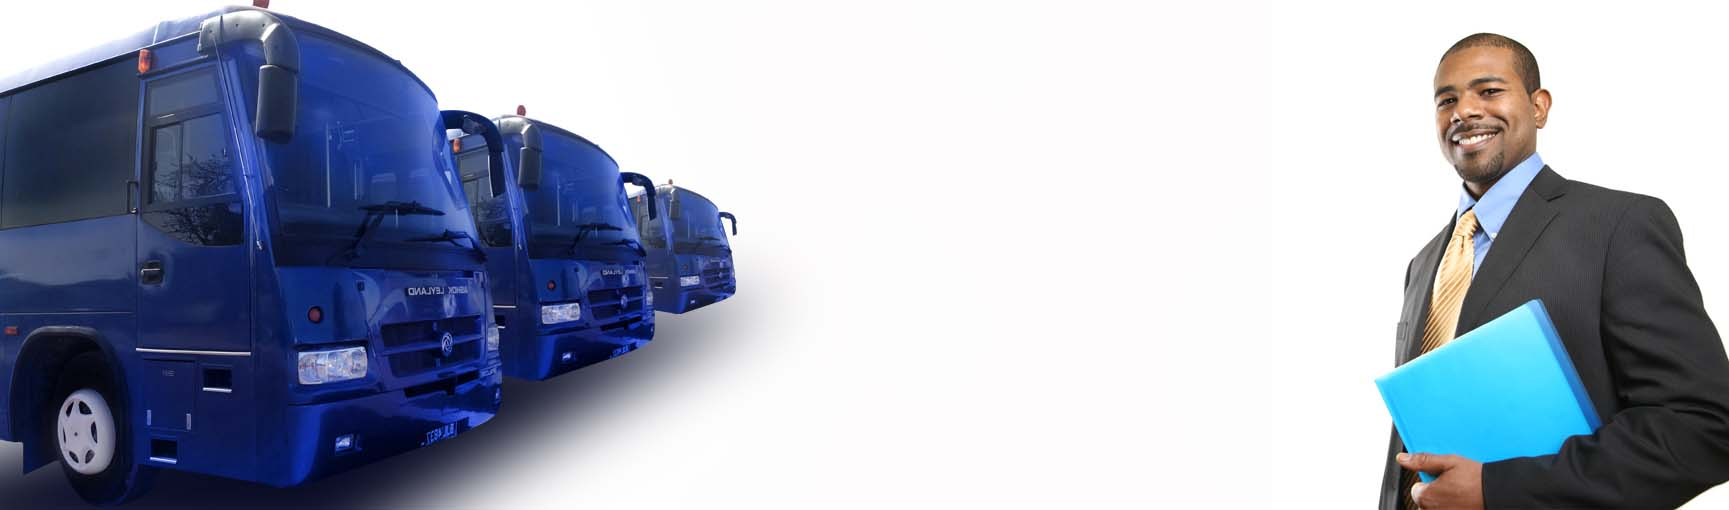 GTSC-BANNER-BLUE-BUS-NEW